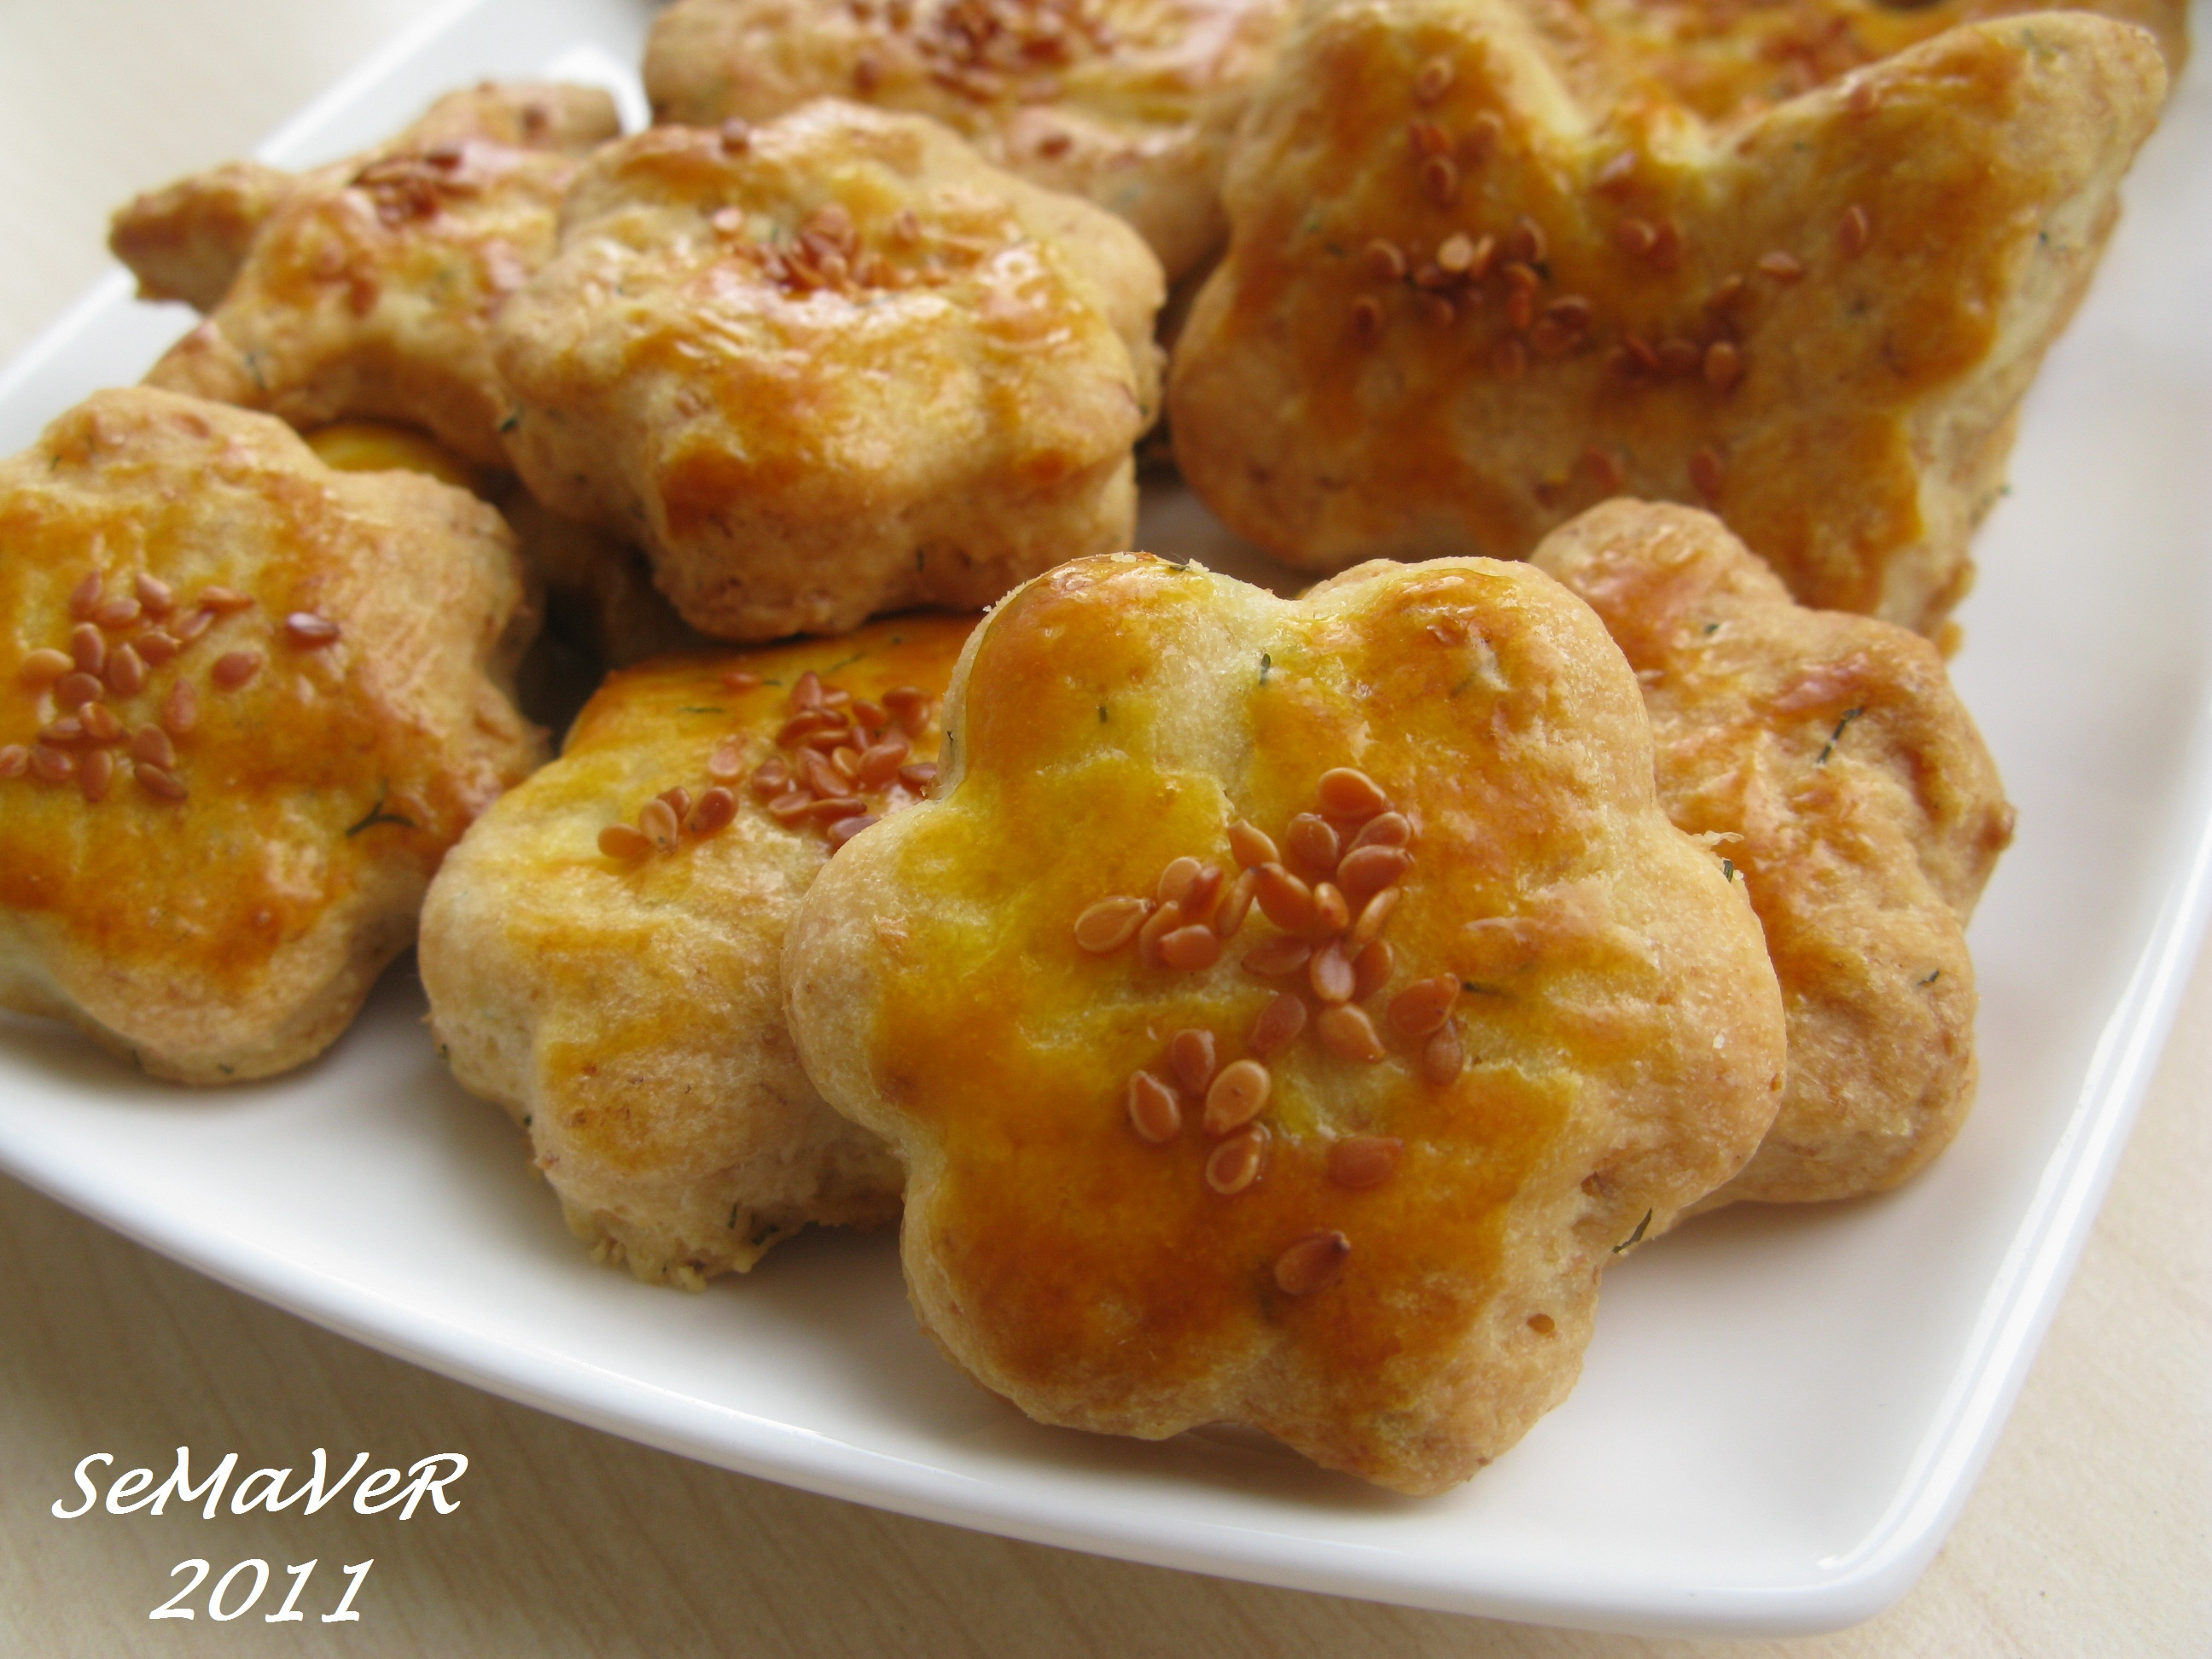 ricottalı tuzlu kurabiye | Flickr - Photo Sharing!